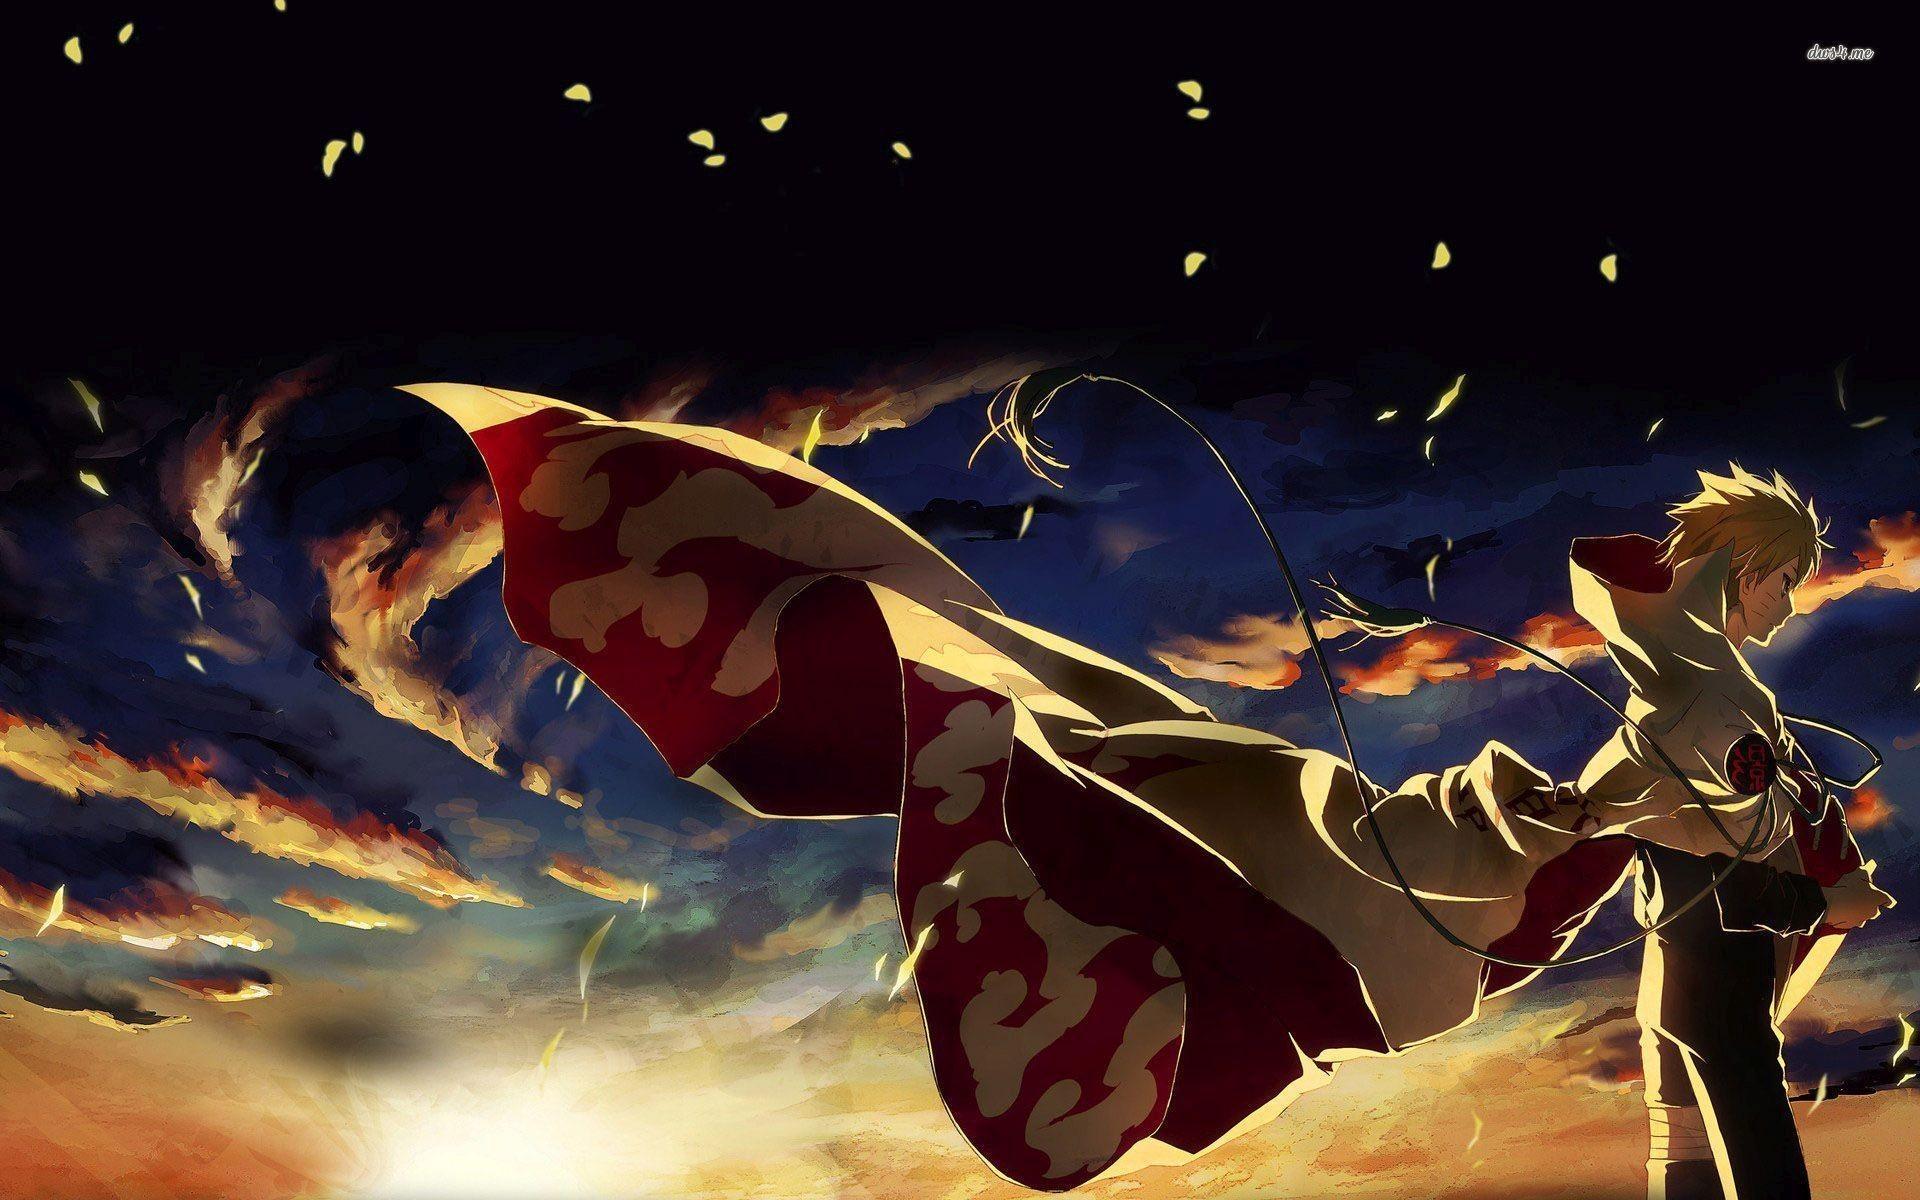 52 Gambar Naruto Wallpaper 3d Kekinian